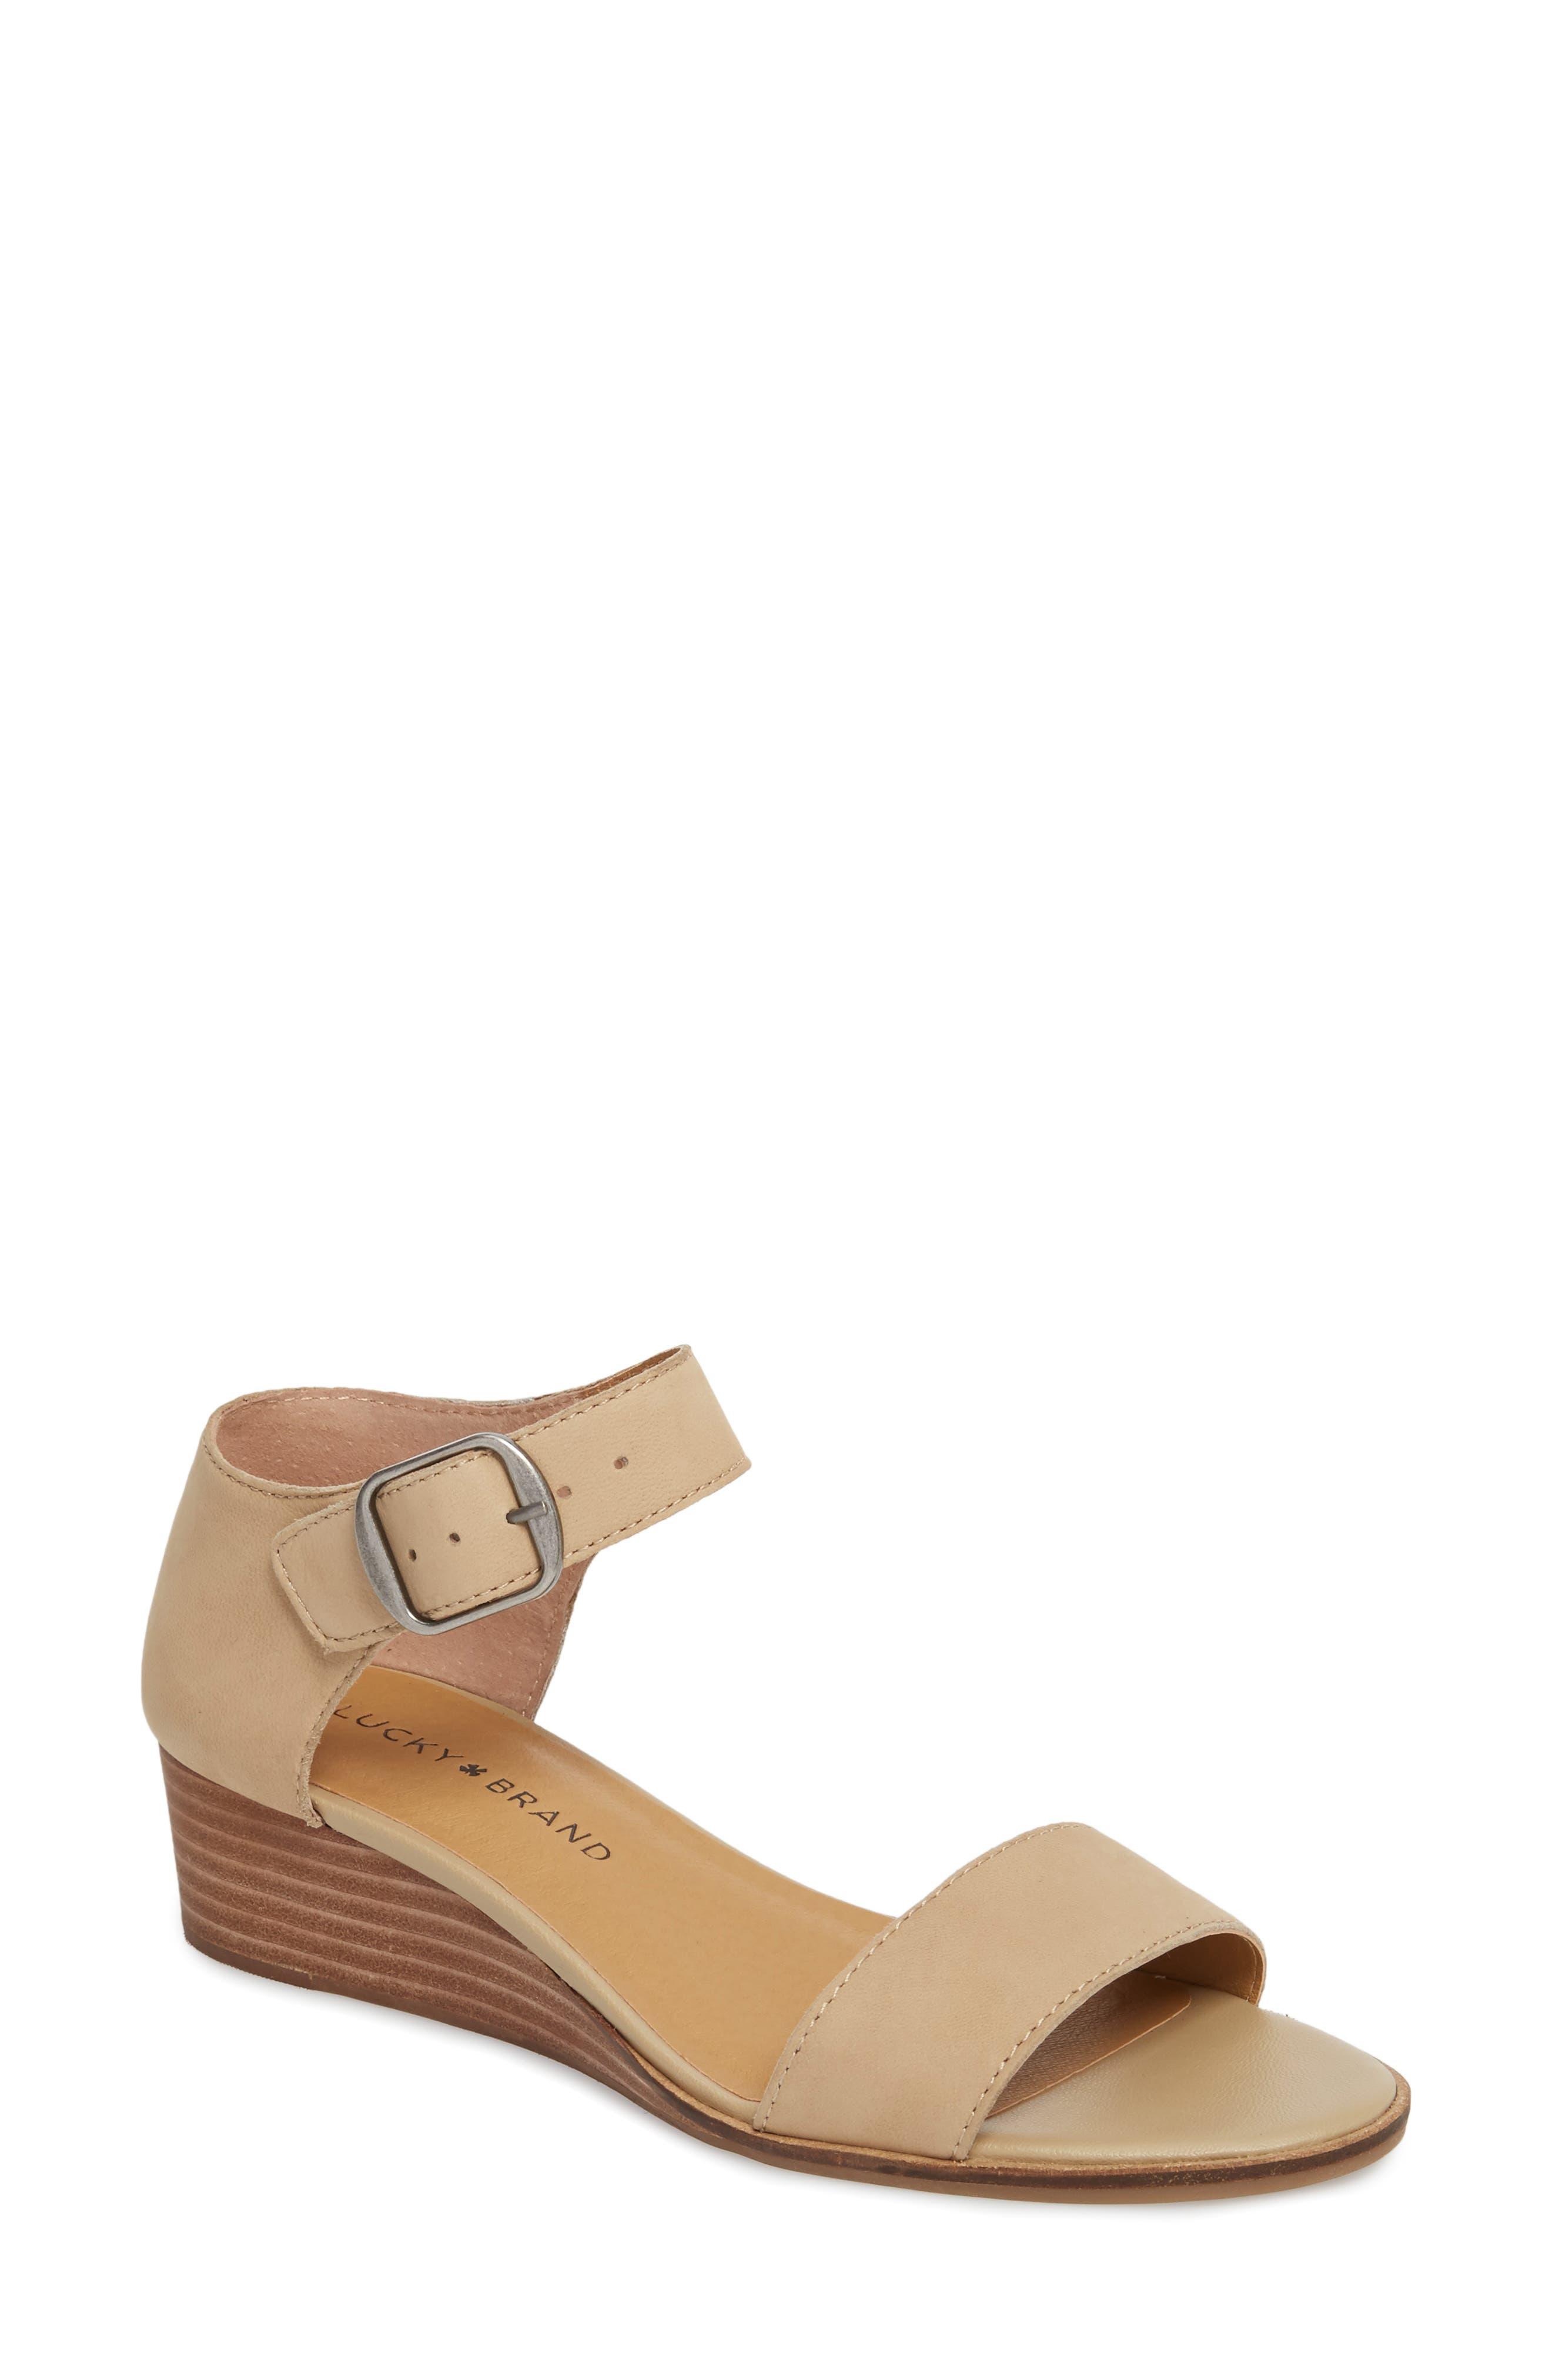 Riamsee Sandal,                         Main,                         color, Travertine Nubuck